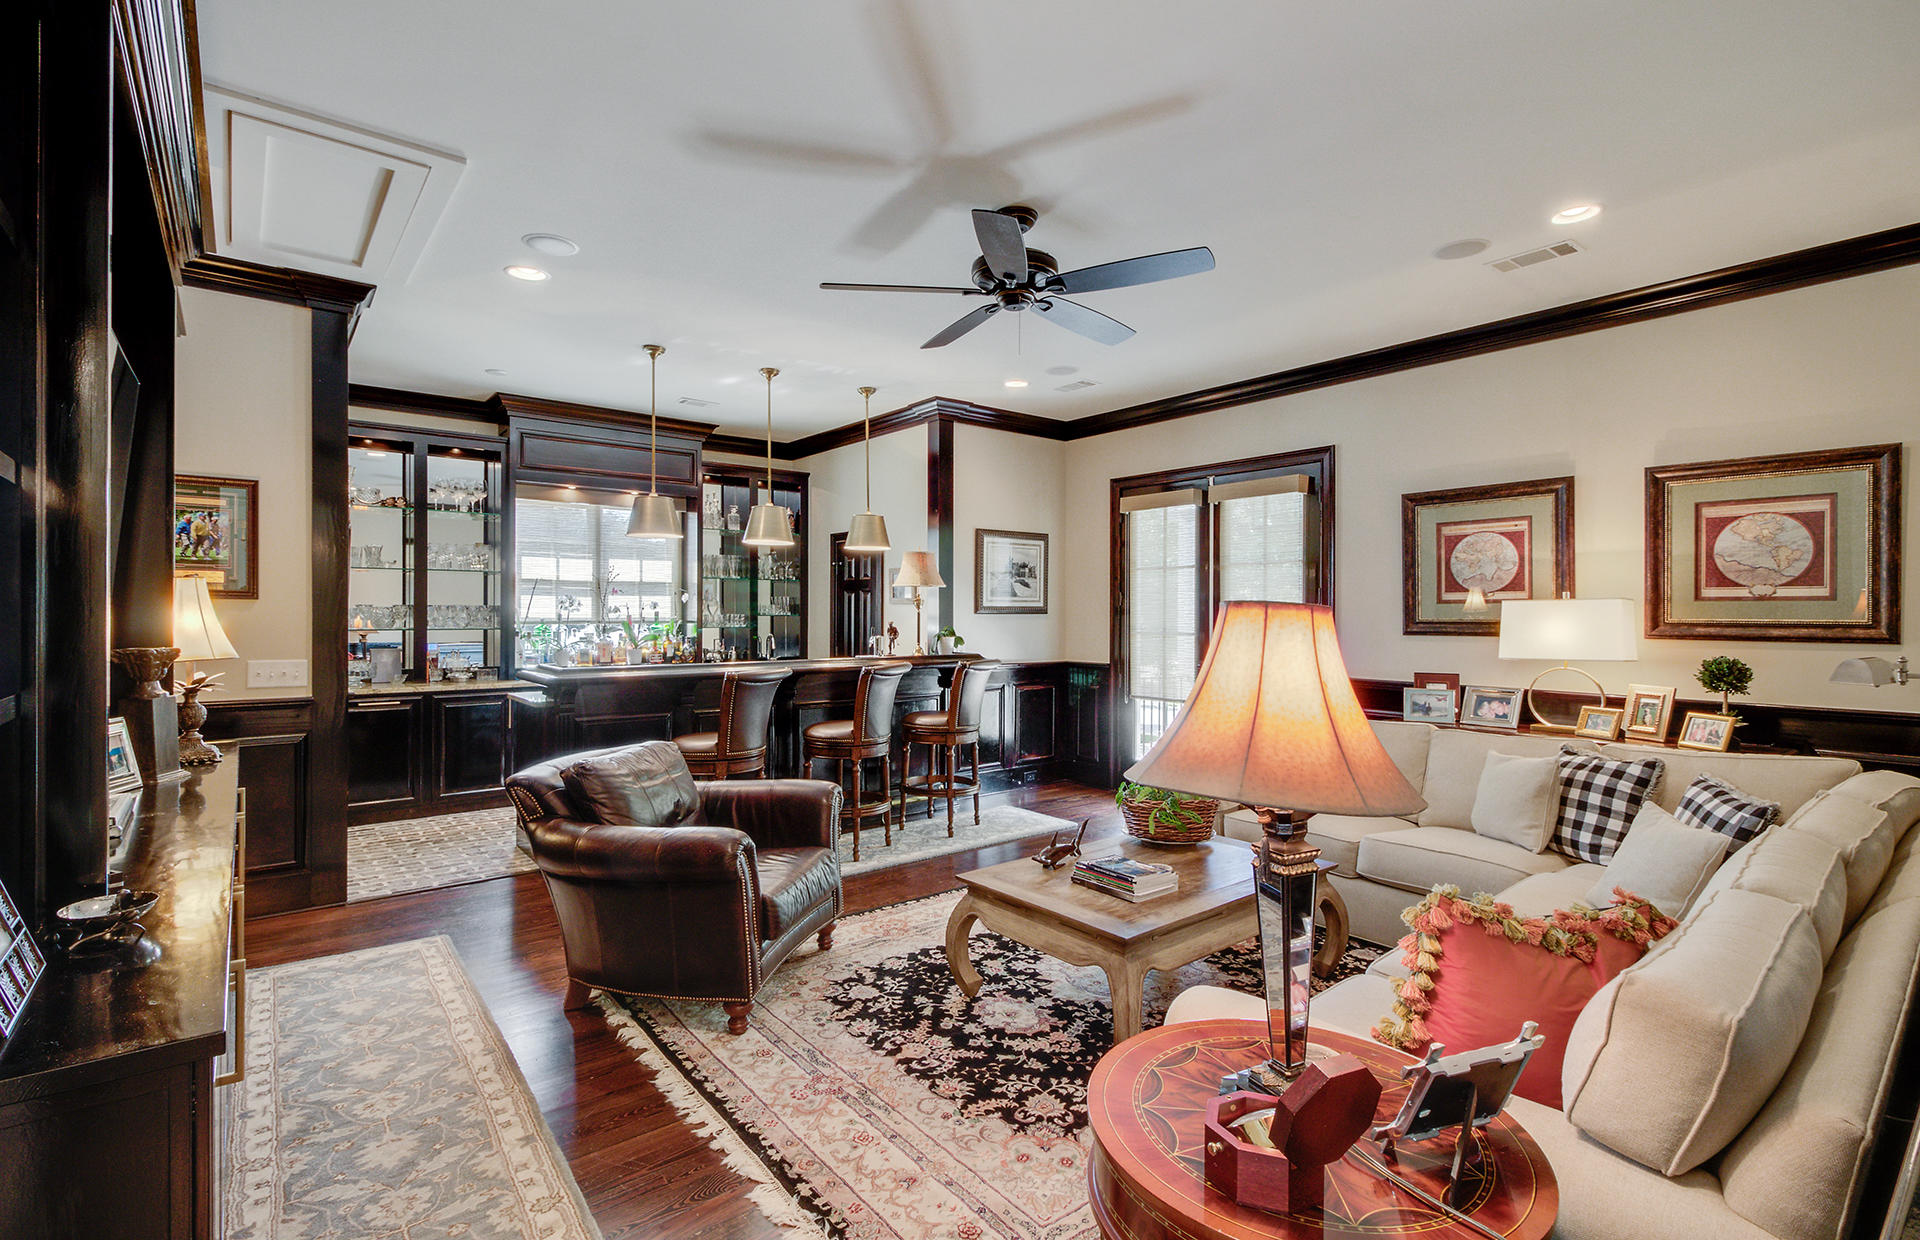 Olde Park Homes For Sale - 770 Olde Central, Mount Pleasant, SC - 48